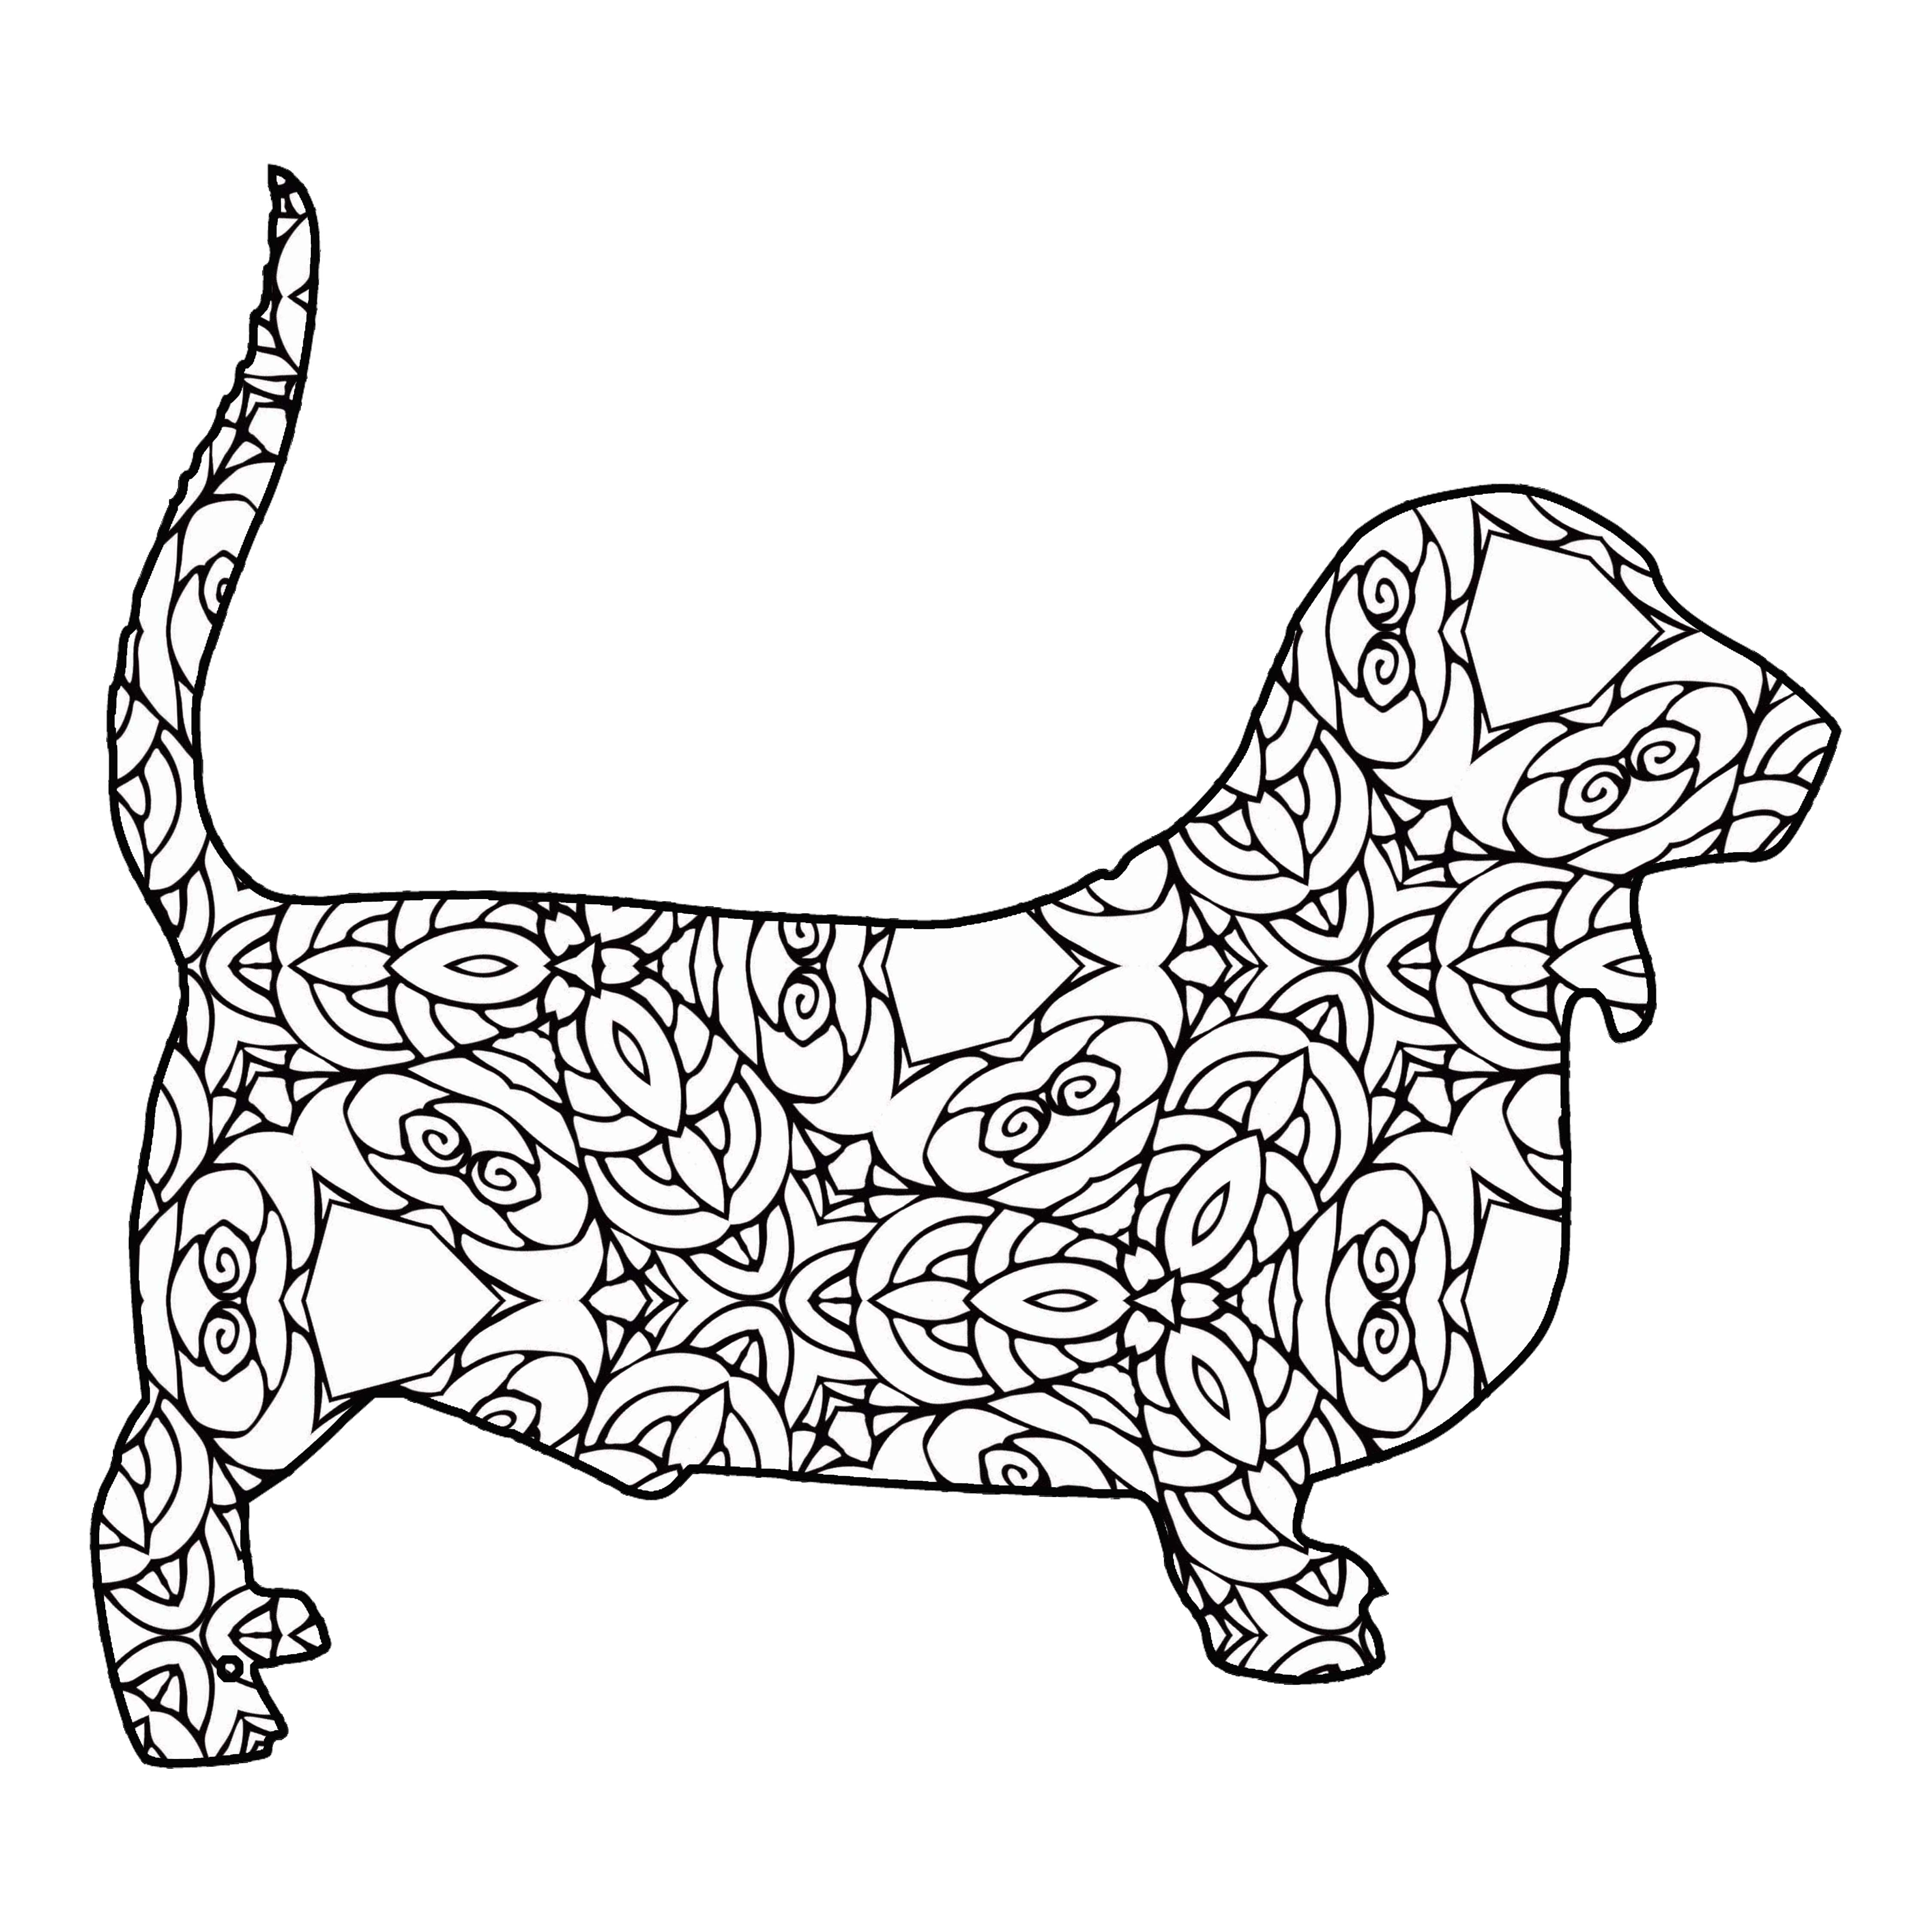 4500x4500 Geometricing Page Free Draw To Coloring Geometric Printable